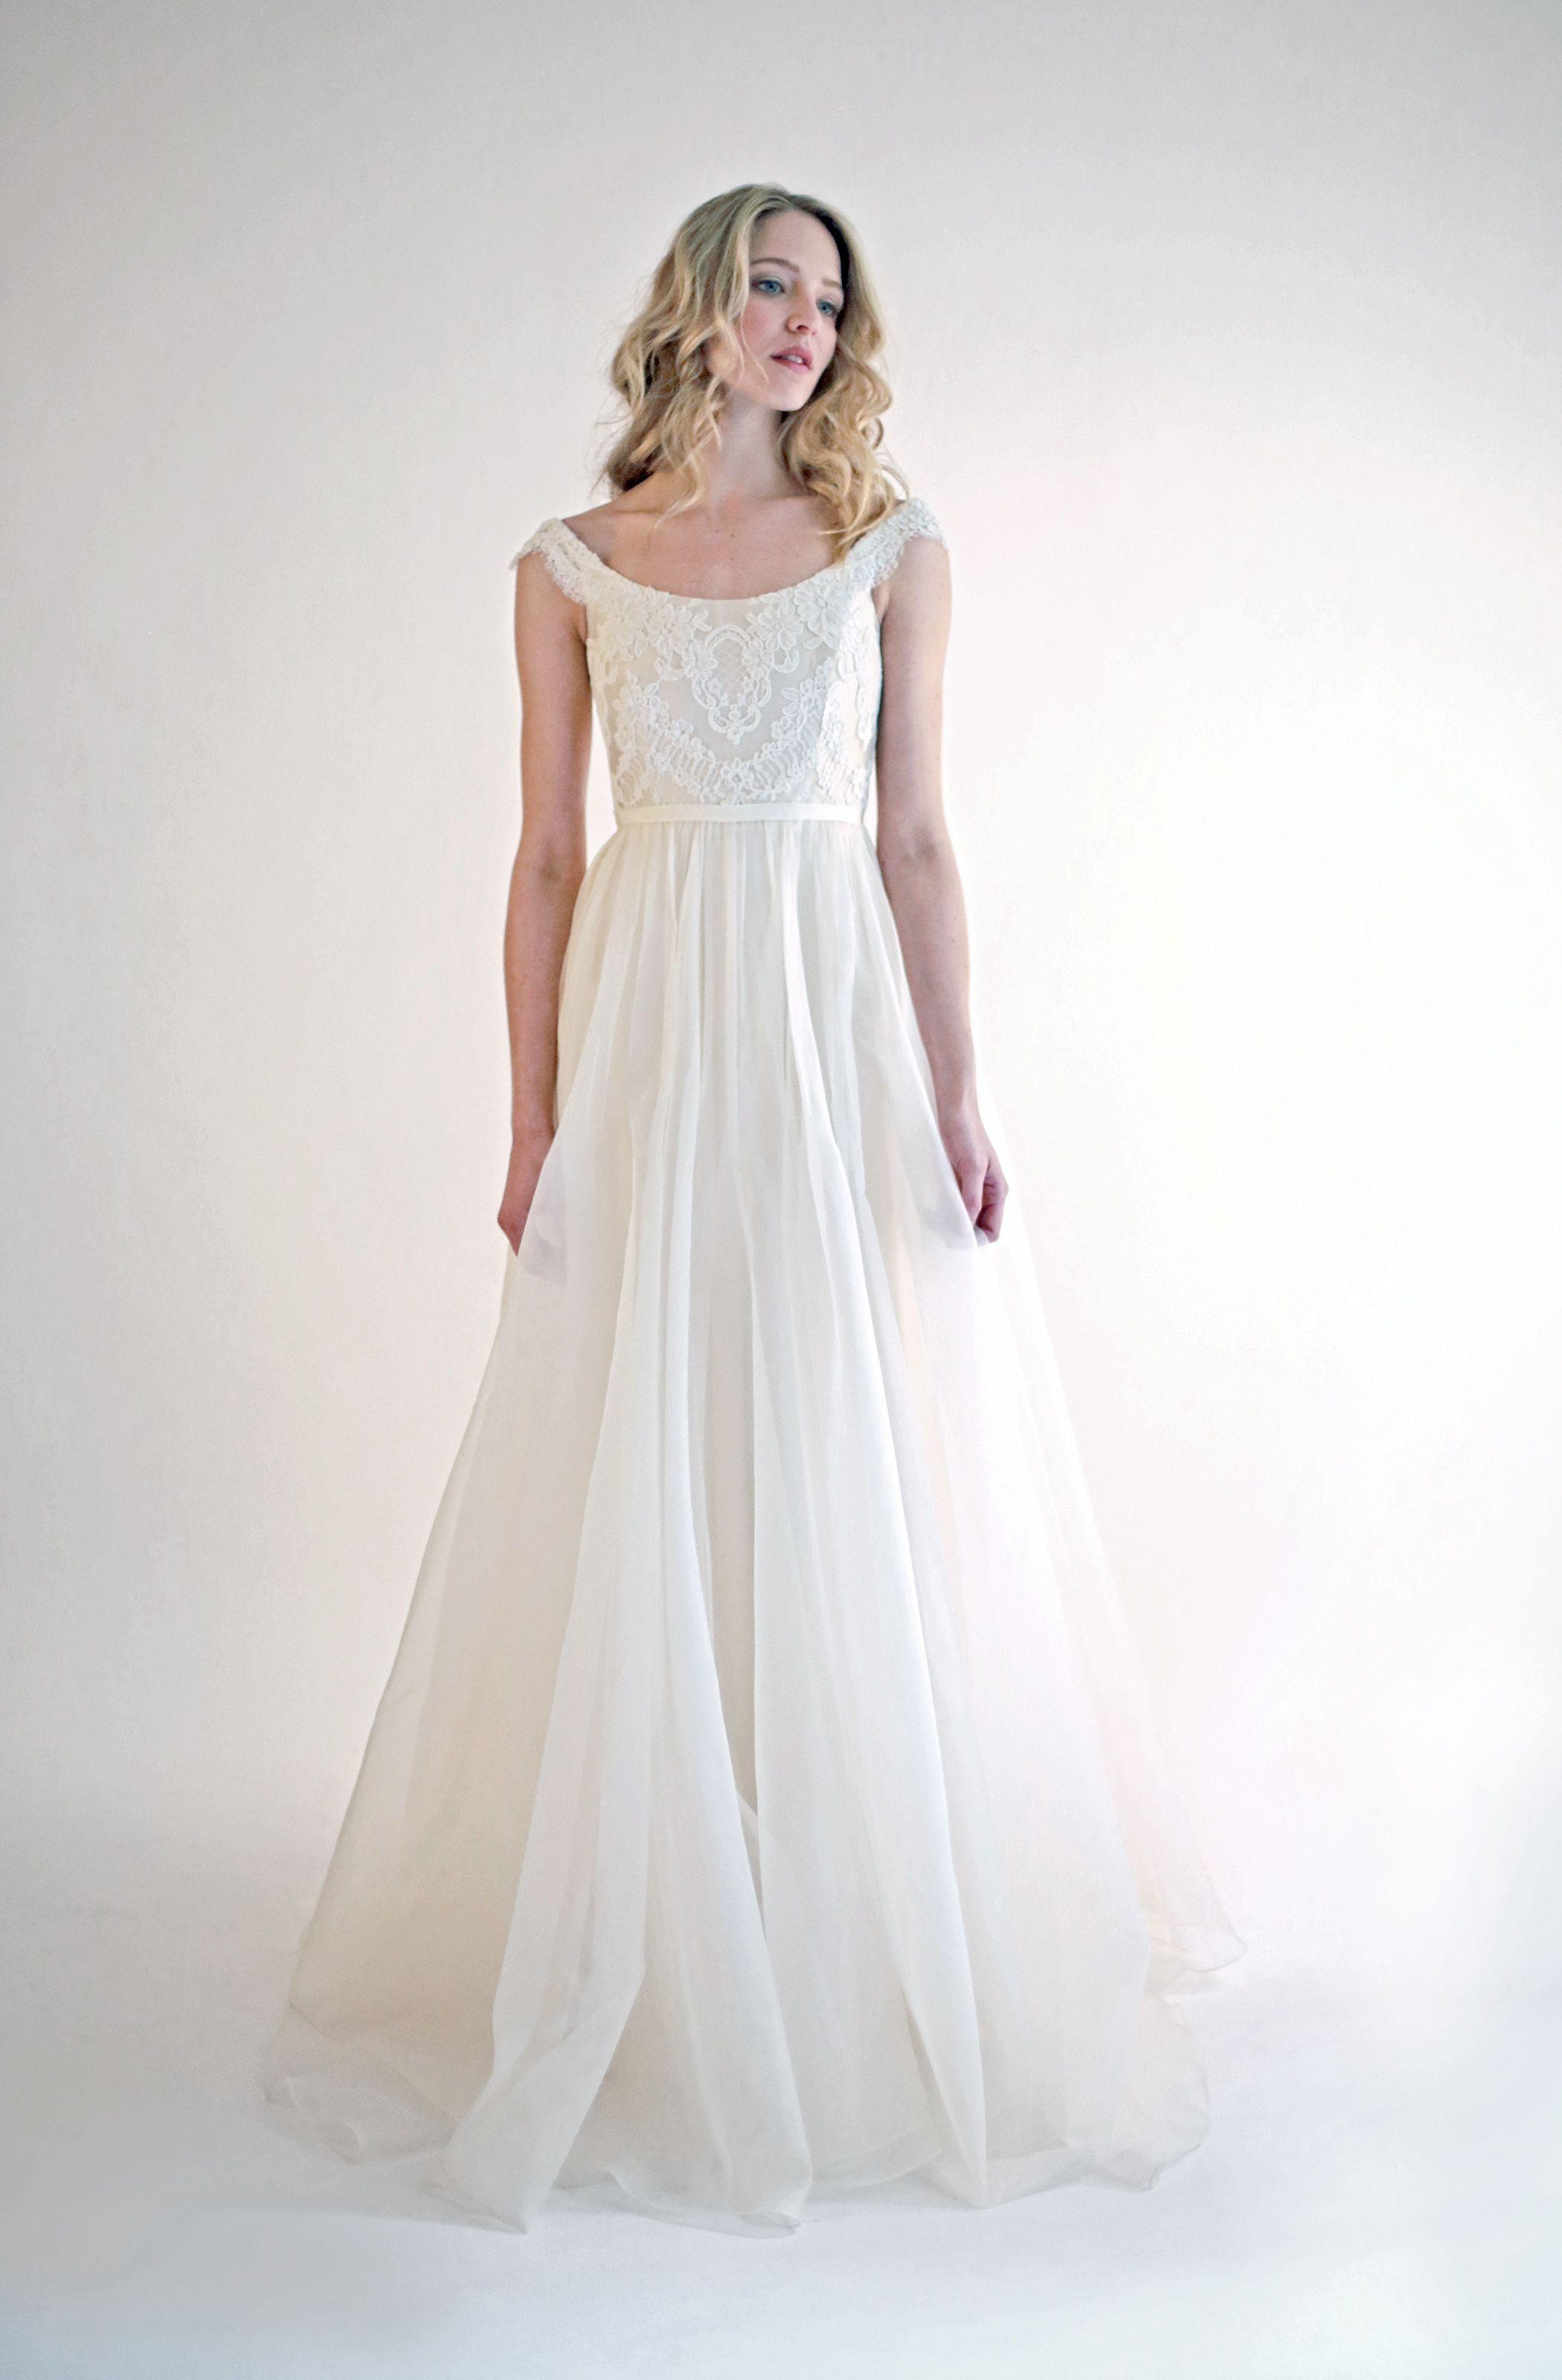 Alia bastamam wedding dress  The Adéle dress is an Ivory scoopneck gown with a full silk organza